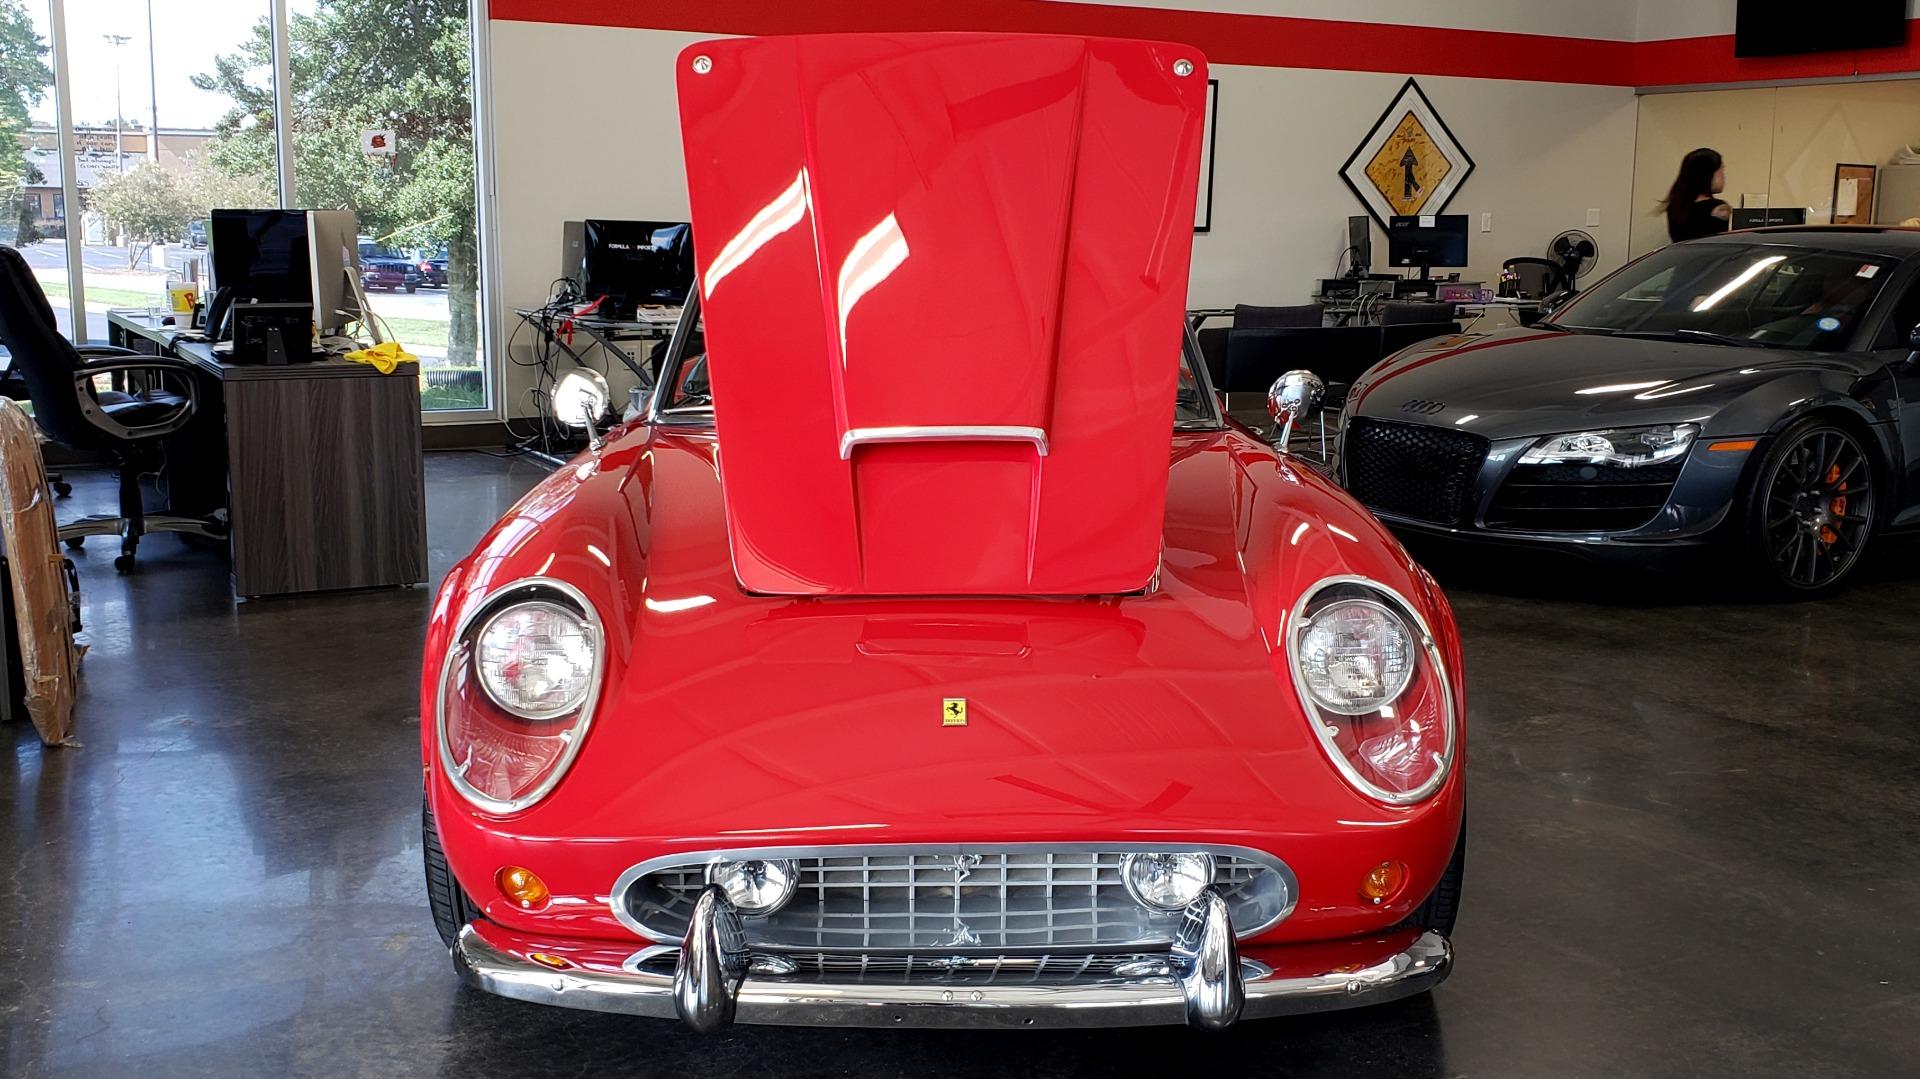 Used 1961 Ferrari 250GT SWB CALIFORNIA REPLICA / 302CI V8 / TREMEC 5-SPEED for sale Sold at Formula Imports in Charlotte NC 28227 77